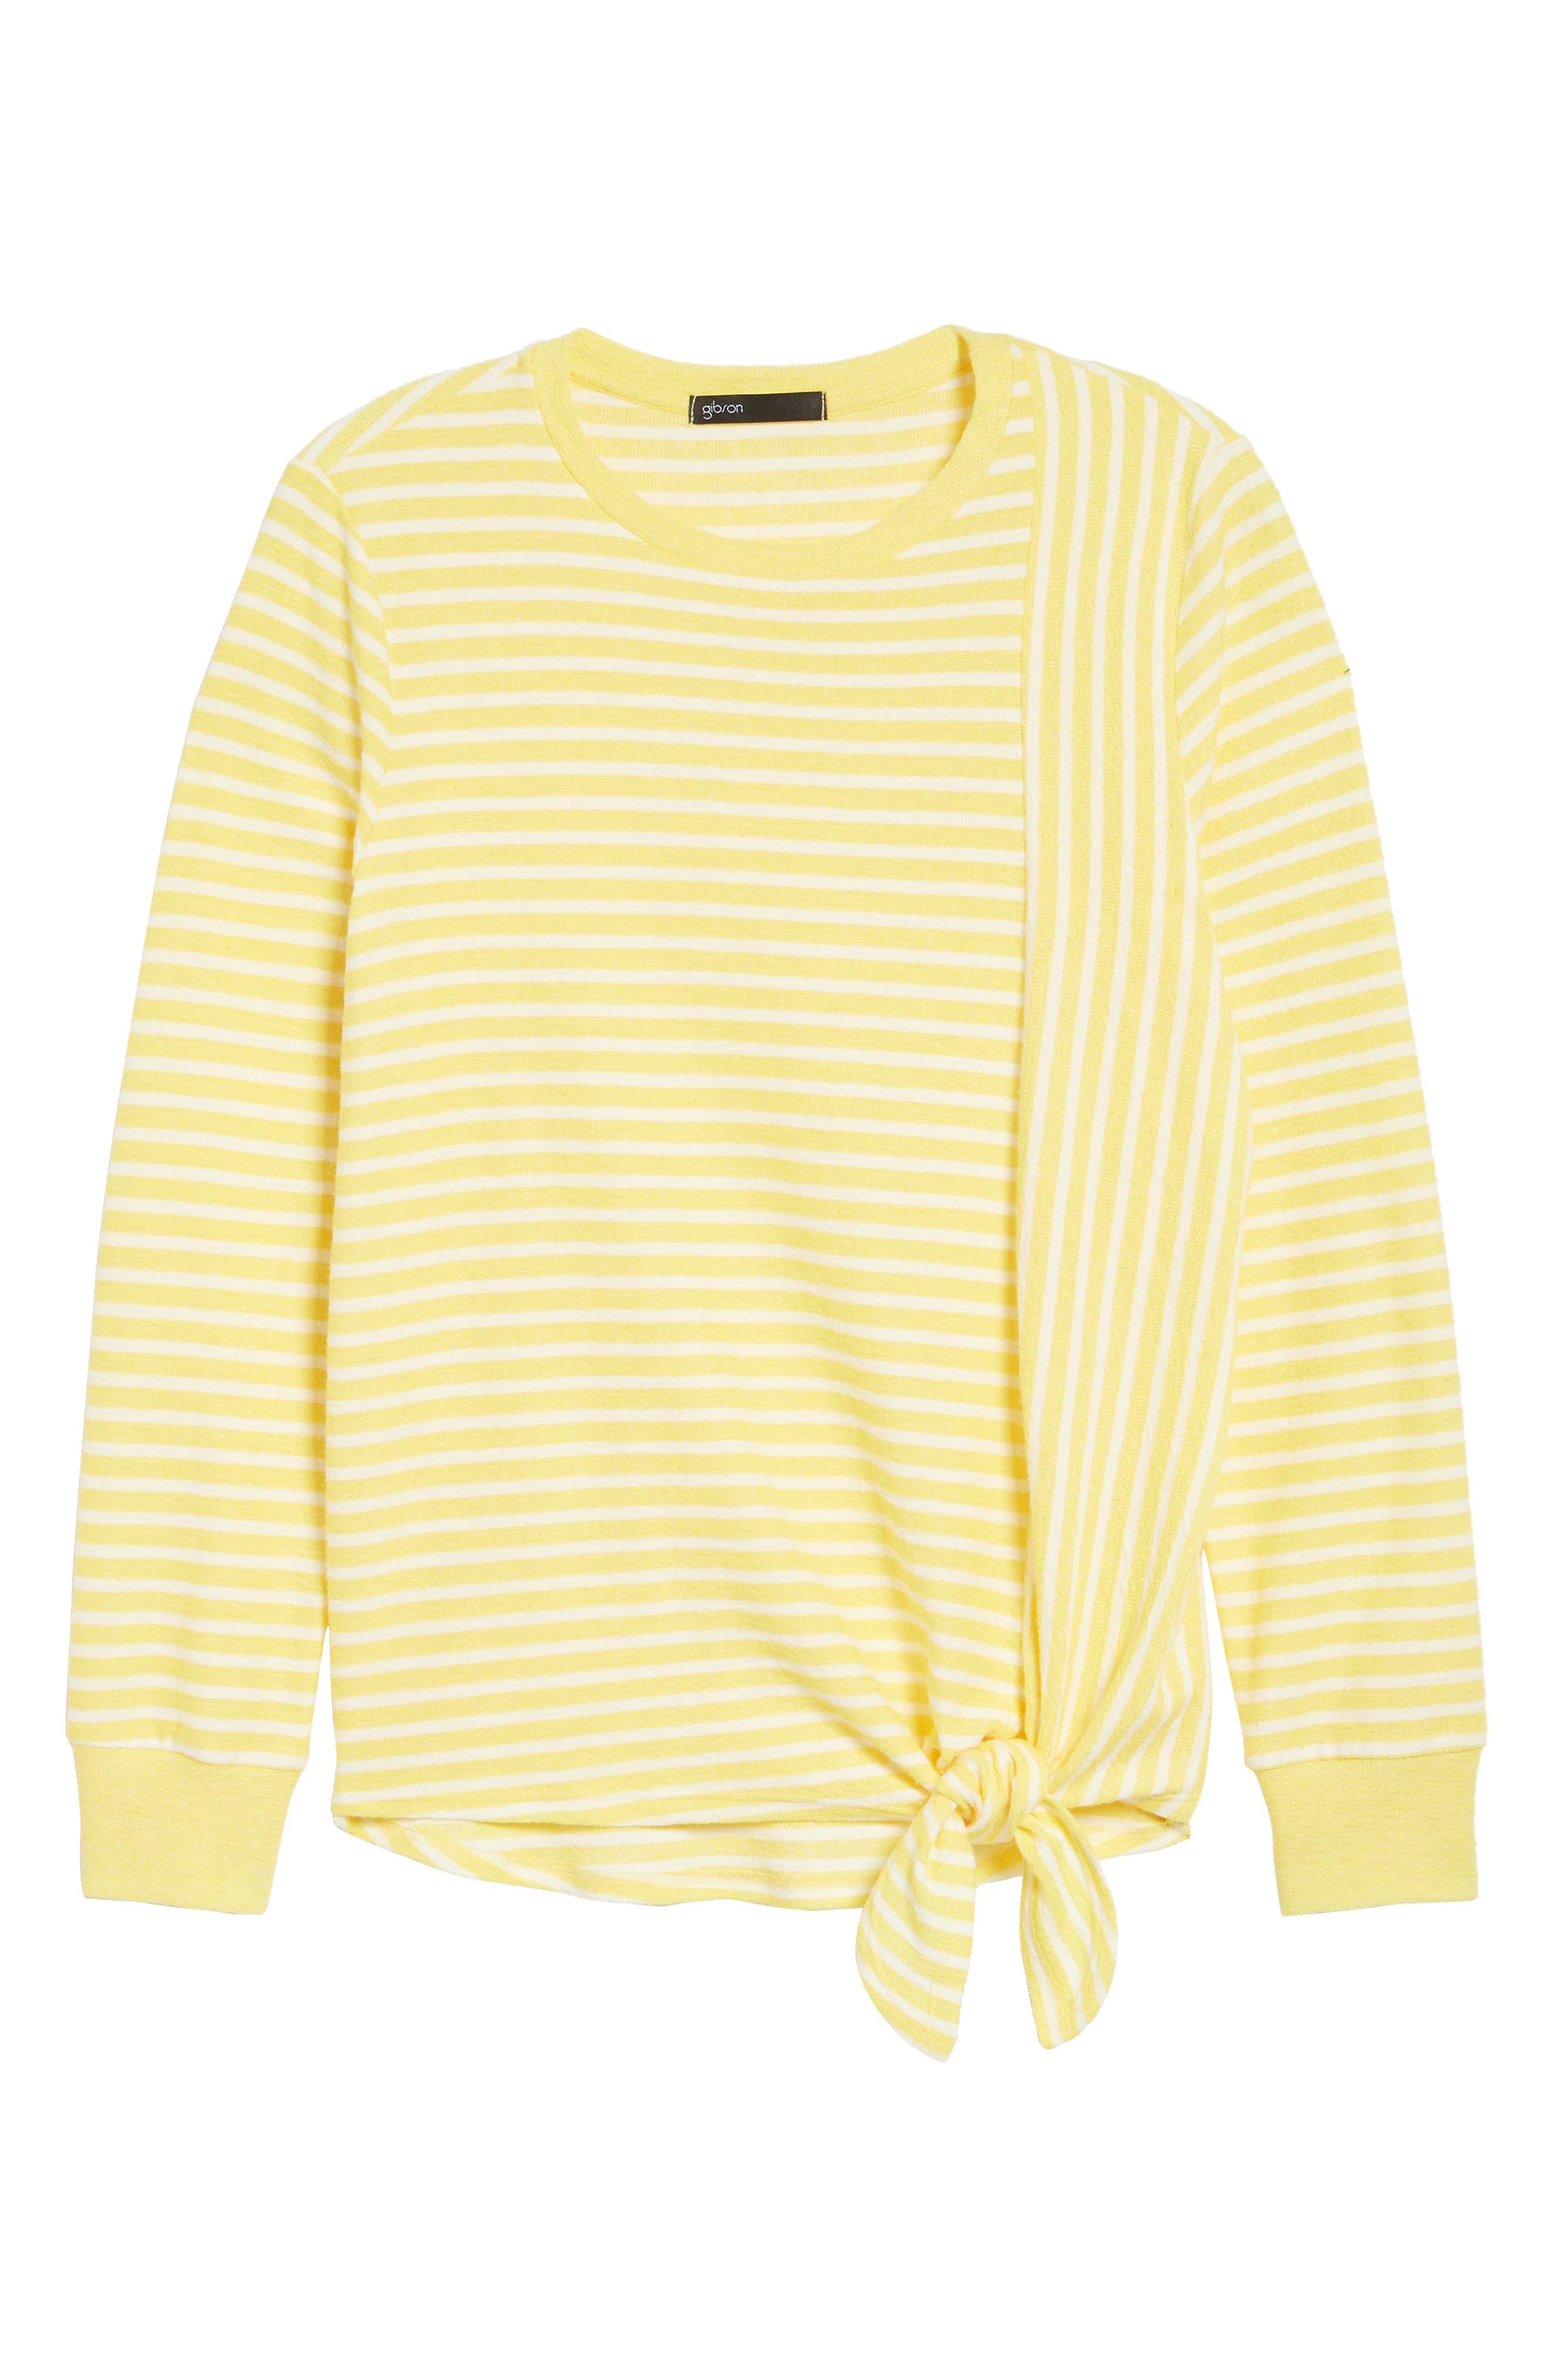 Tie Front Stripe Top,                             Alternate thumbnail 7, color,                             Yellow/ White Stripe